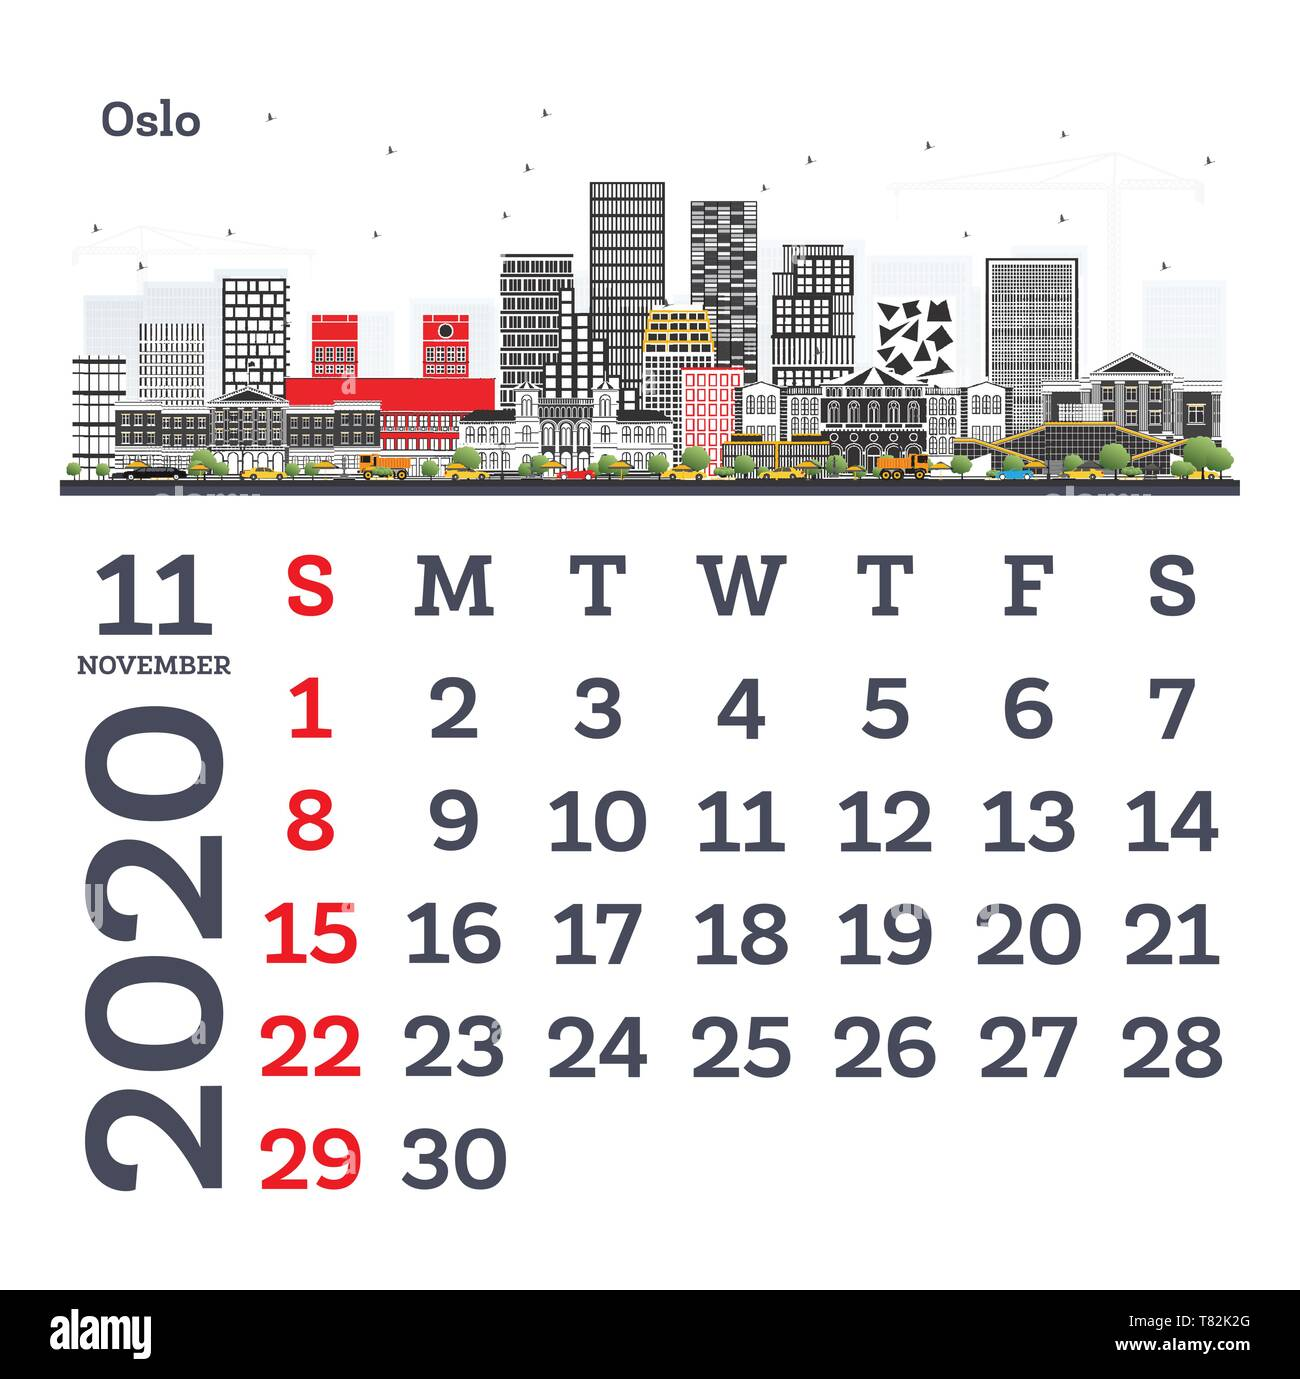 Novembre 2020 Calendario.Novembre 2020 Calendario Modello Con Oslo Skyline Della